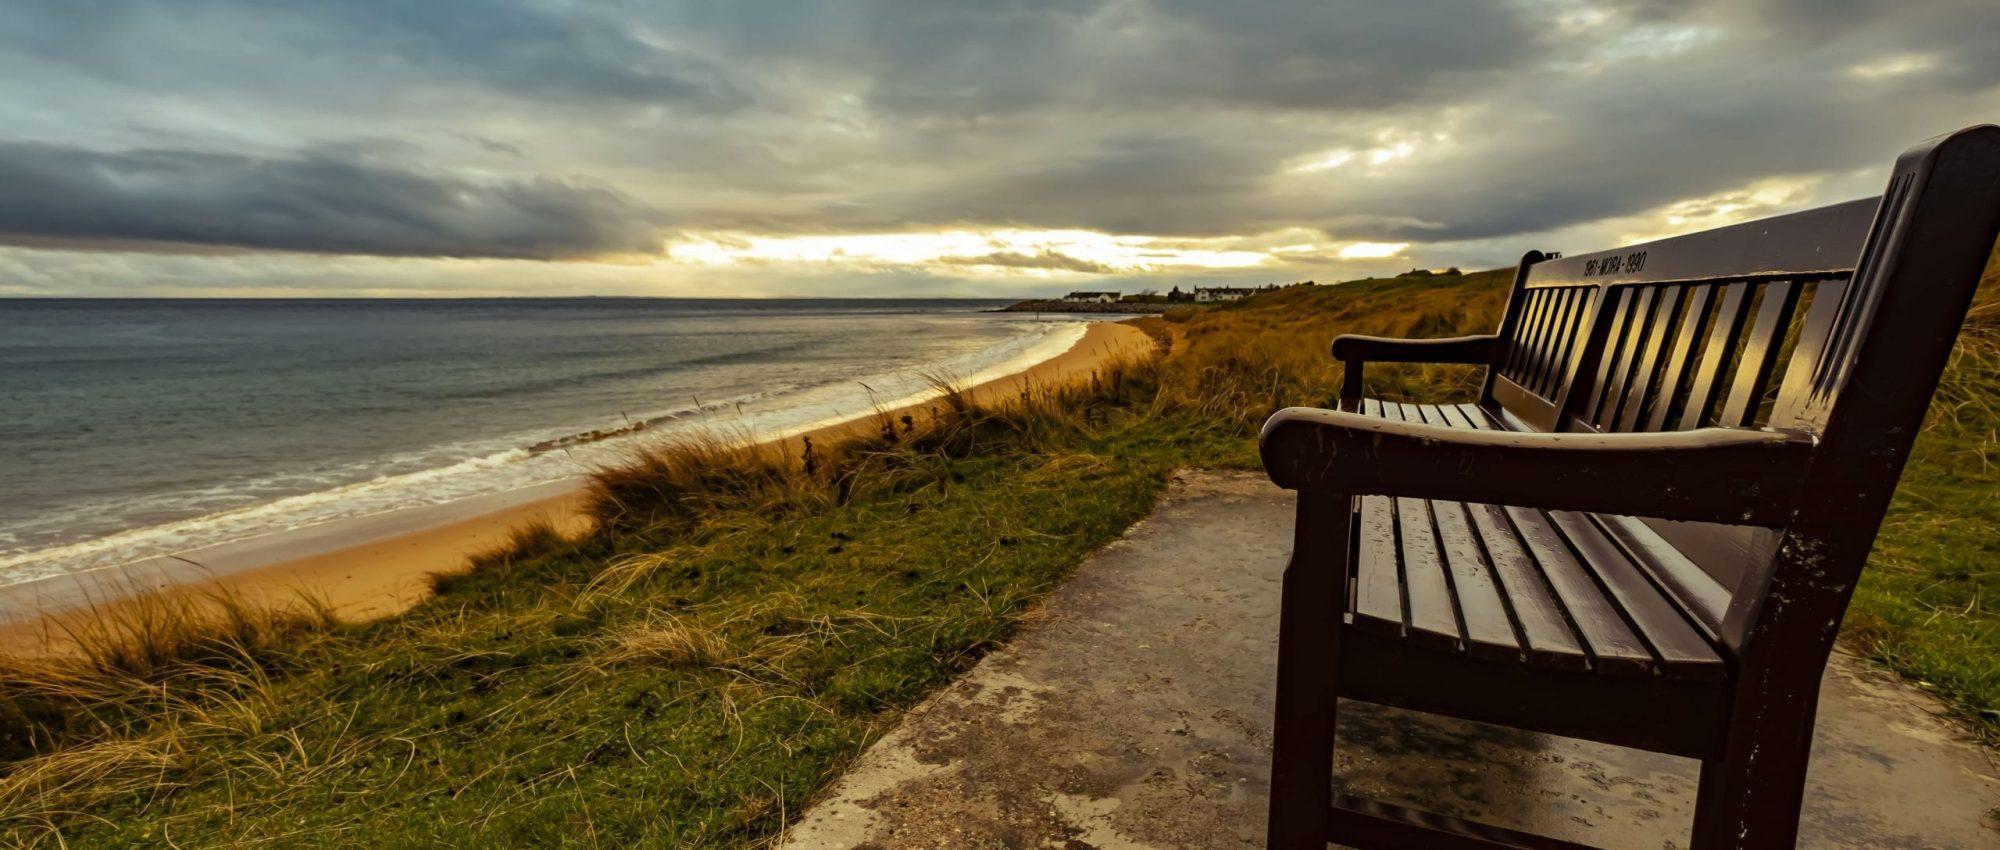 Brora Beach